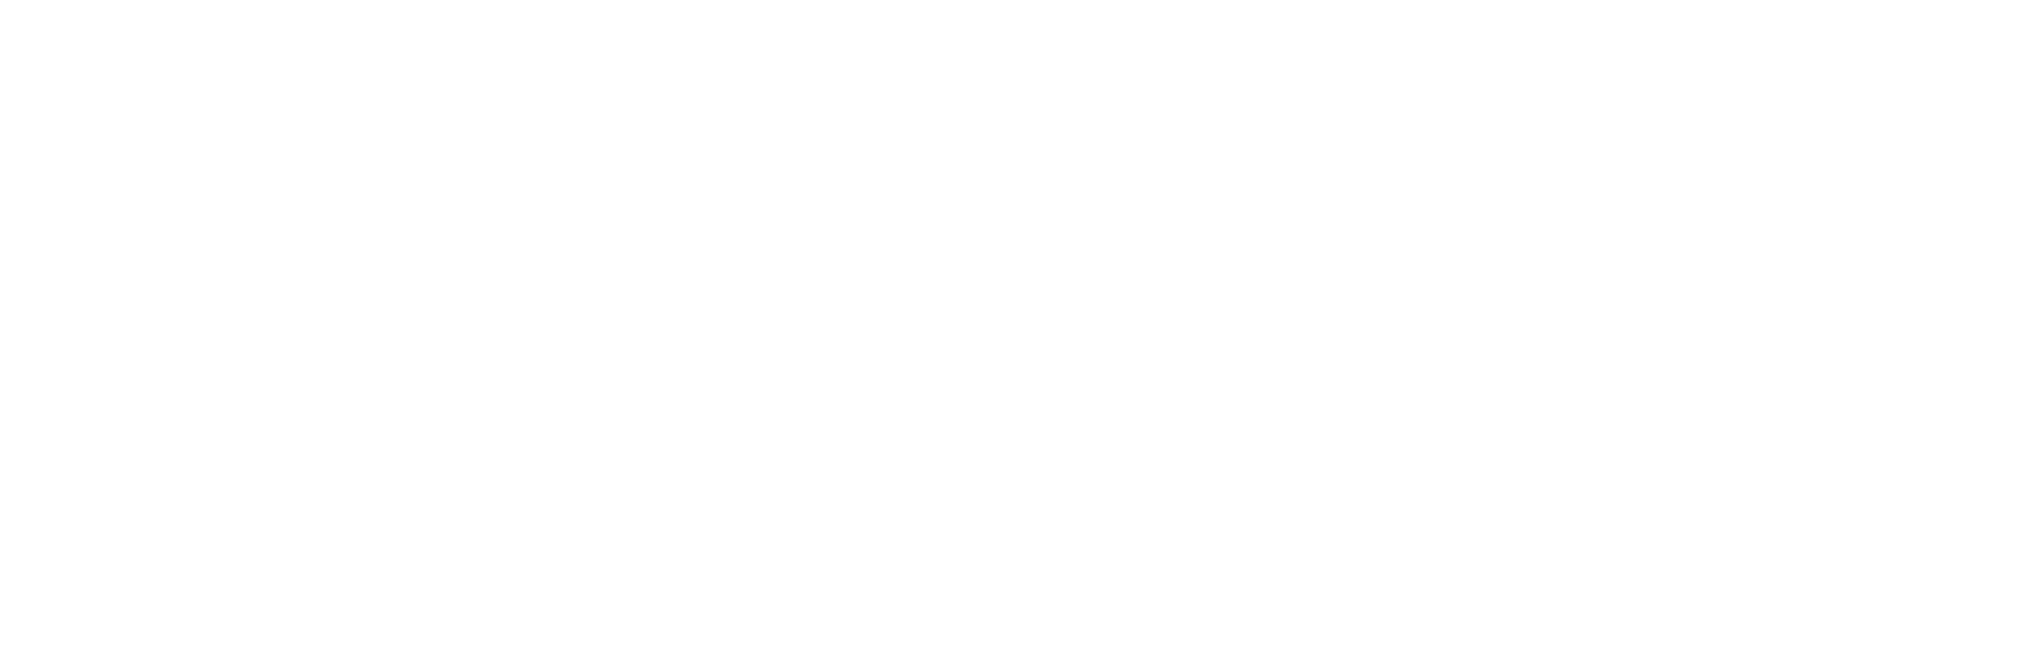 Boardtrust Academy